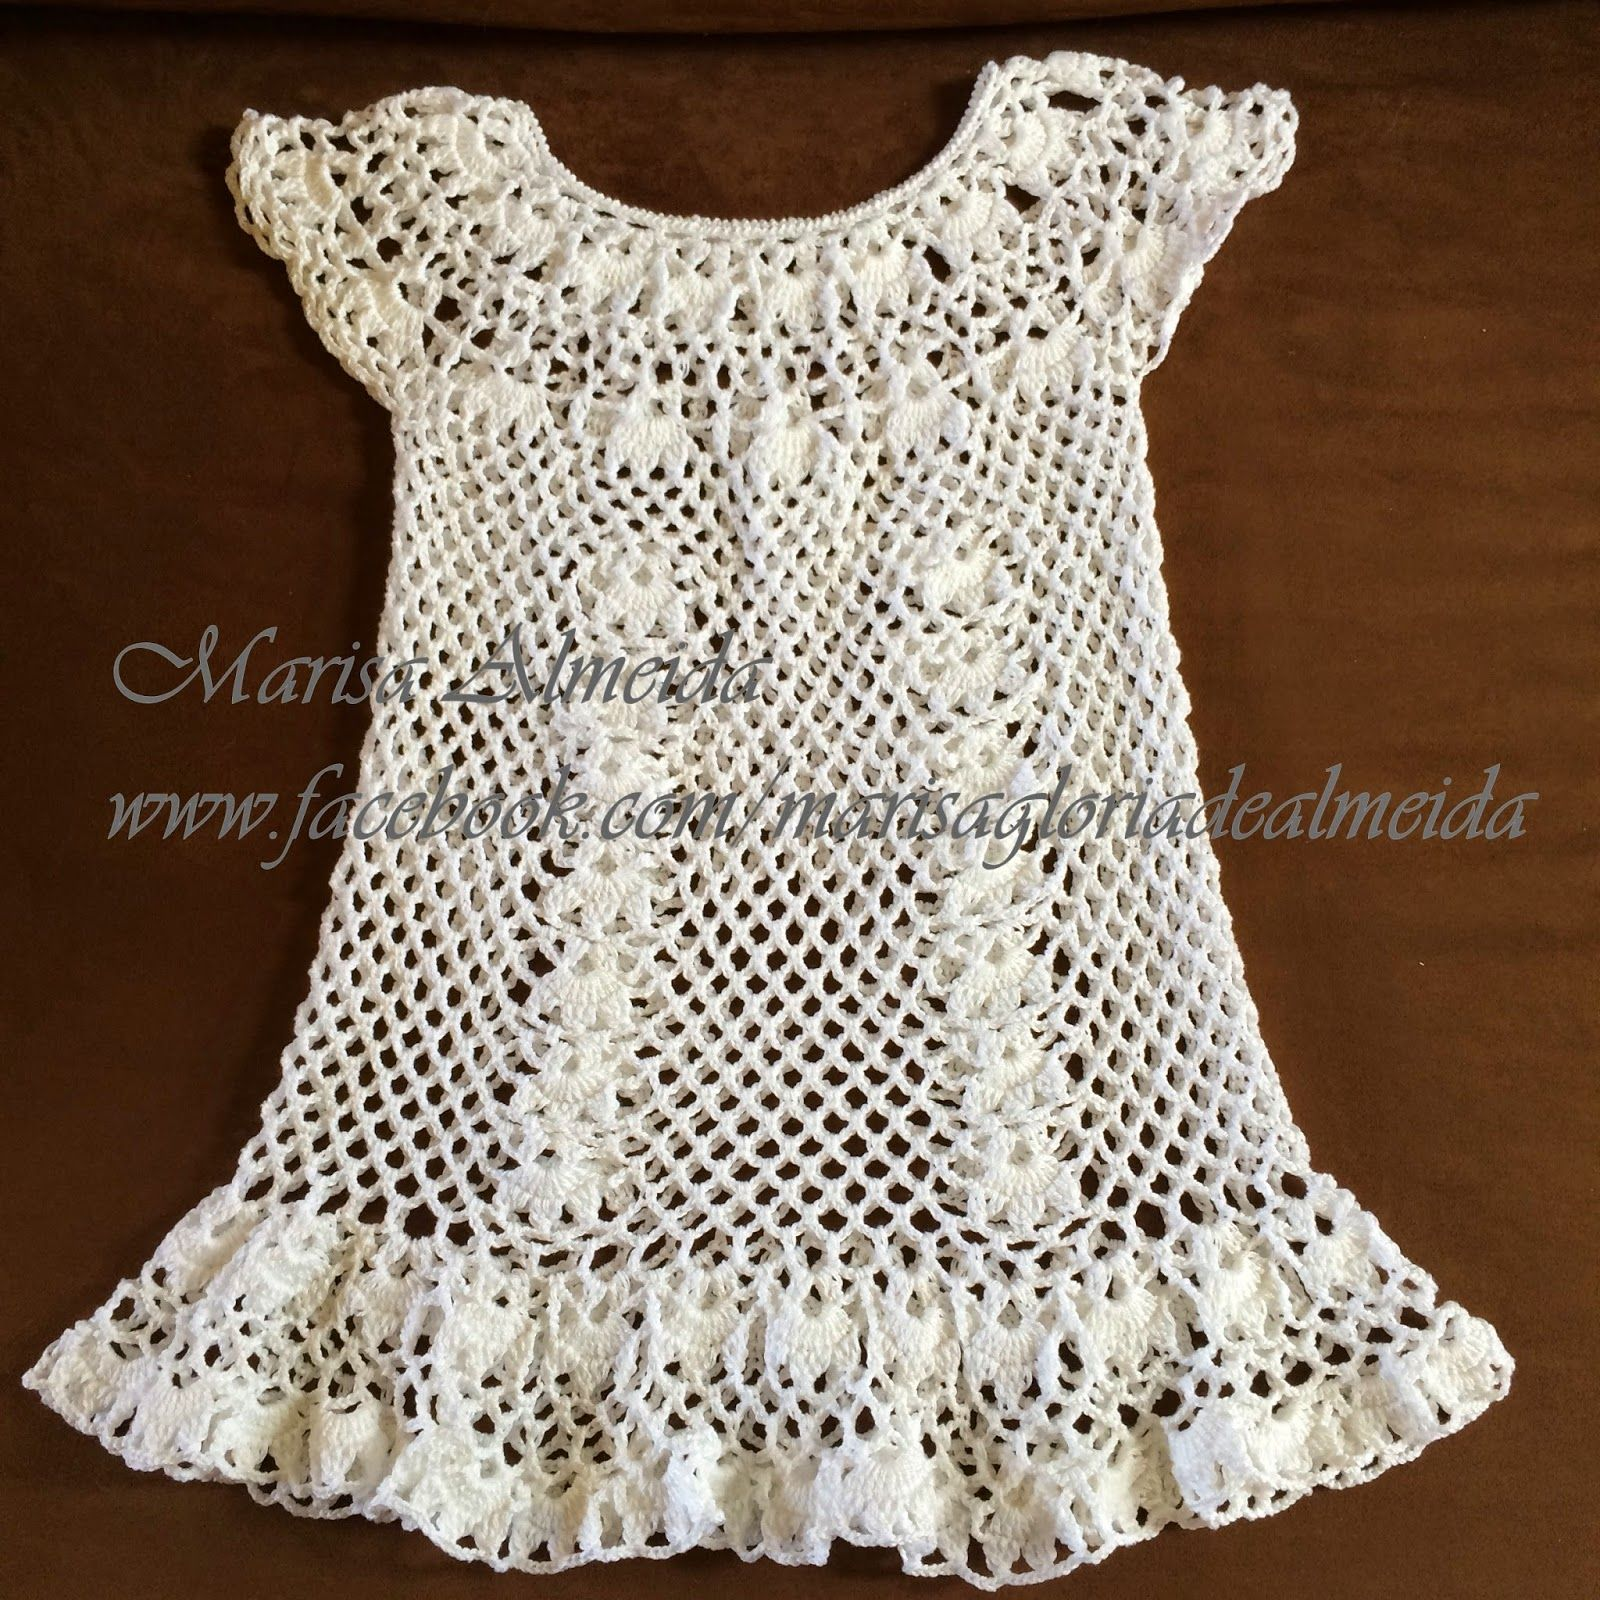 Marisa Almeida Tricot Crochet   Saída Praia Crochet  05abf2fa88e